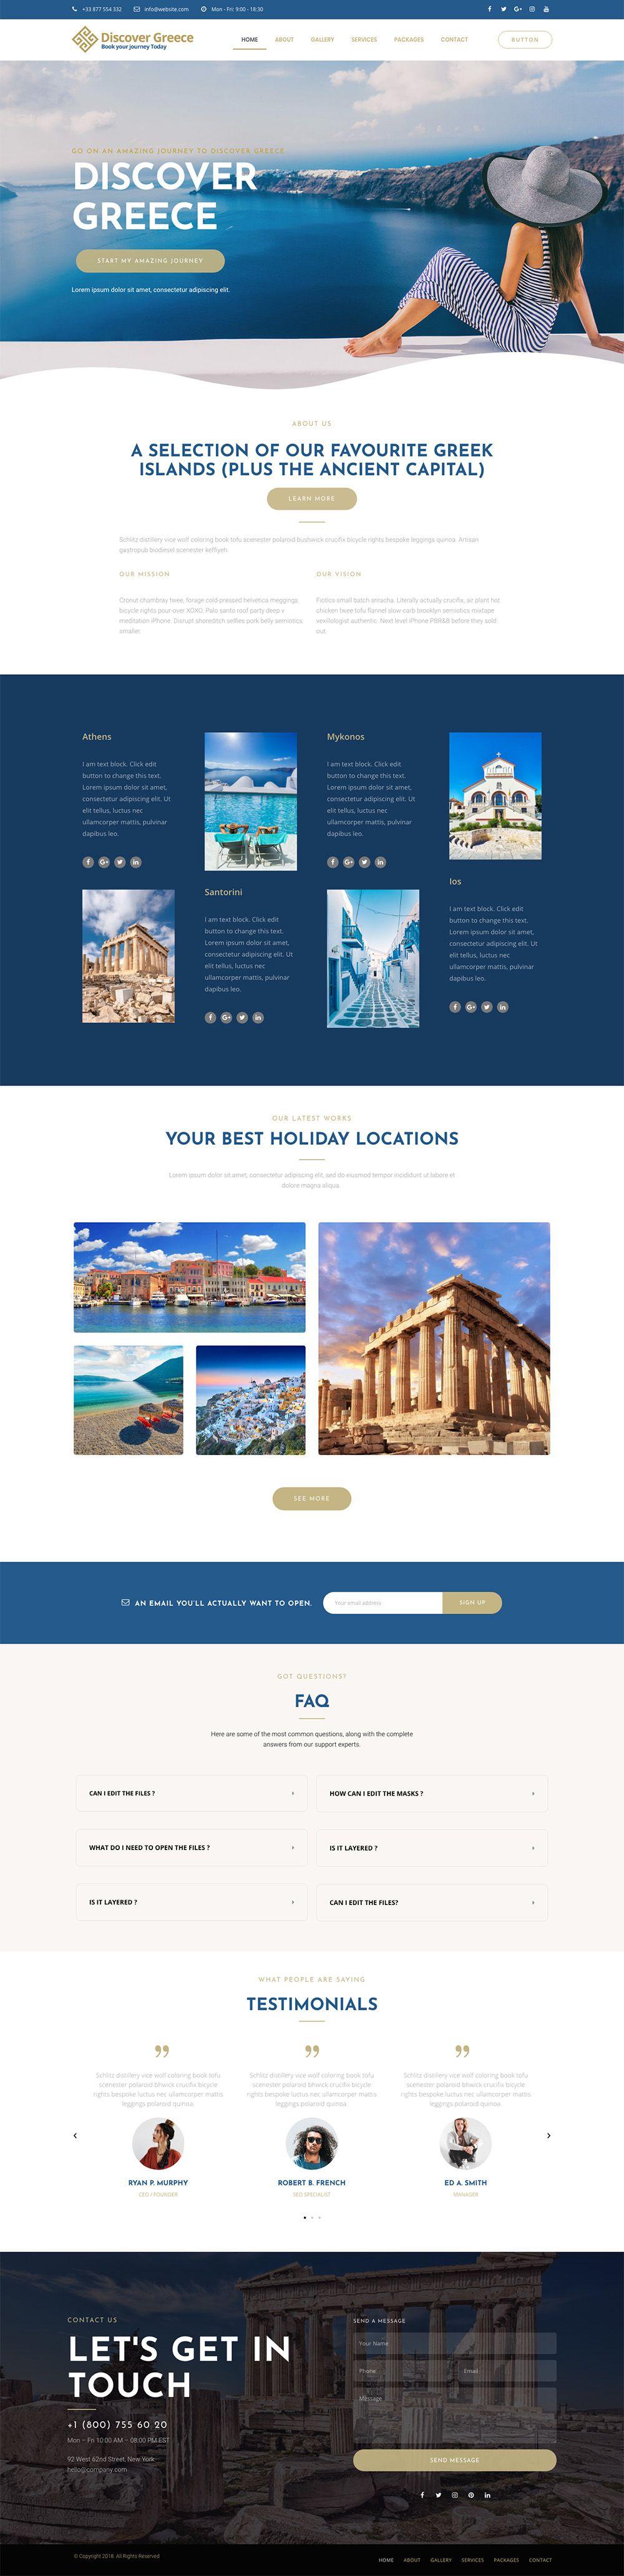 Web And App Design Travel Agent Website For Greek Holidays Web App Design Web Design App Design